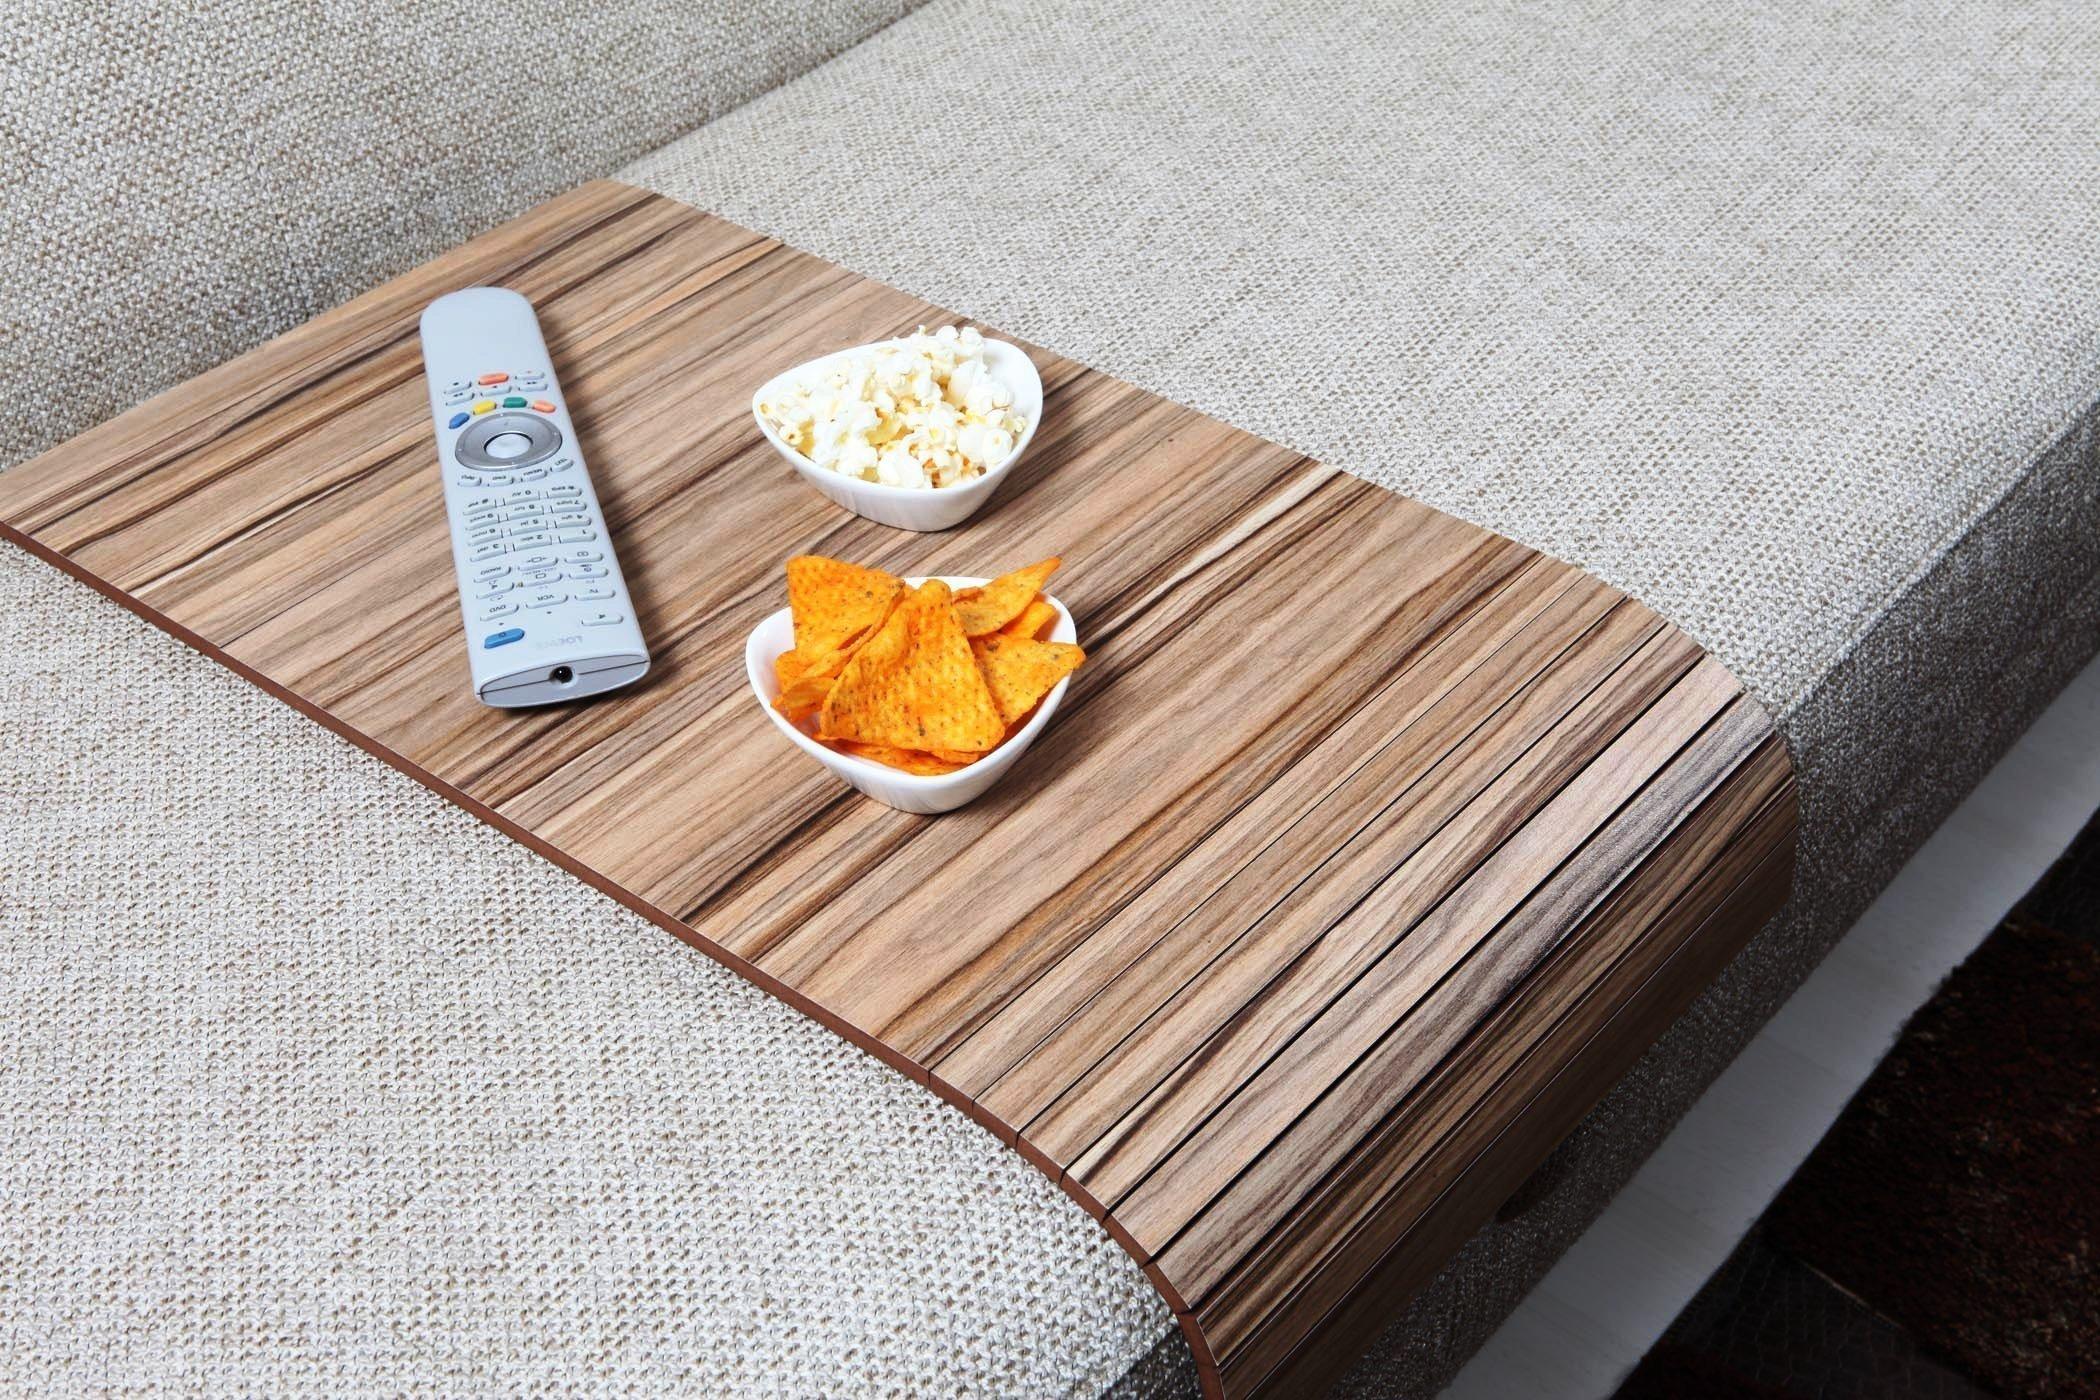 Sofa Tray Table - Long (European Walnut), Sofa Arm Tray, Armrest Tray, Sofa Arm Table, Couch Tray, Coffee Table, Sofa Table,Wood Tray,Wood Gifts